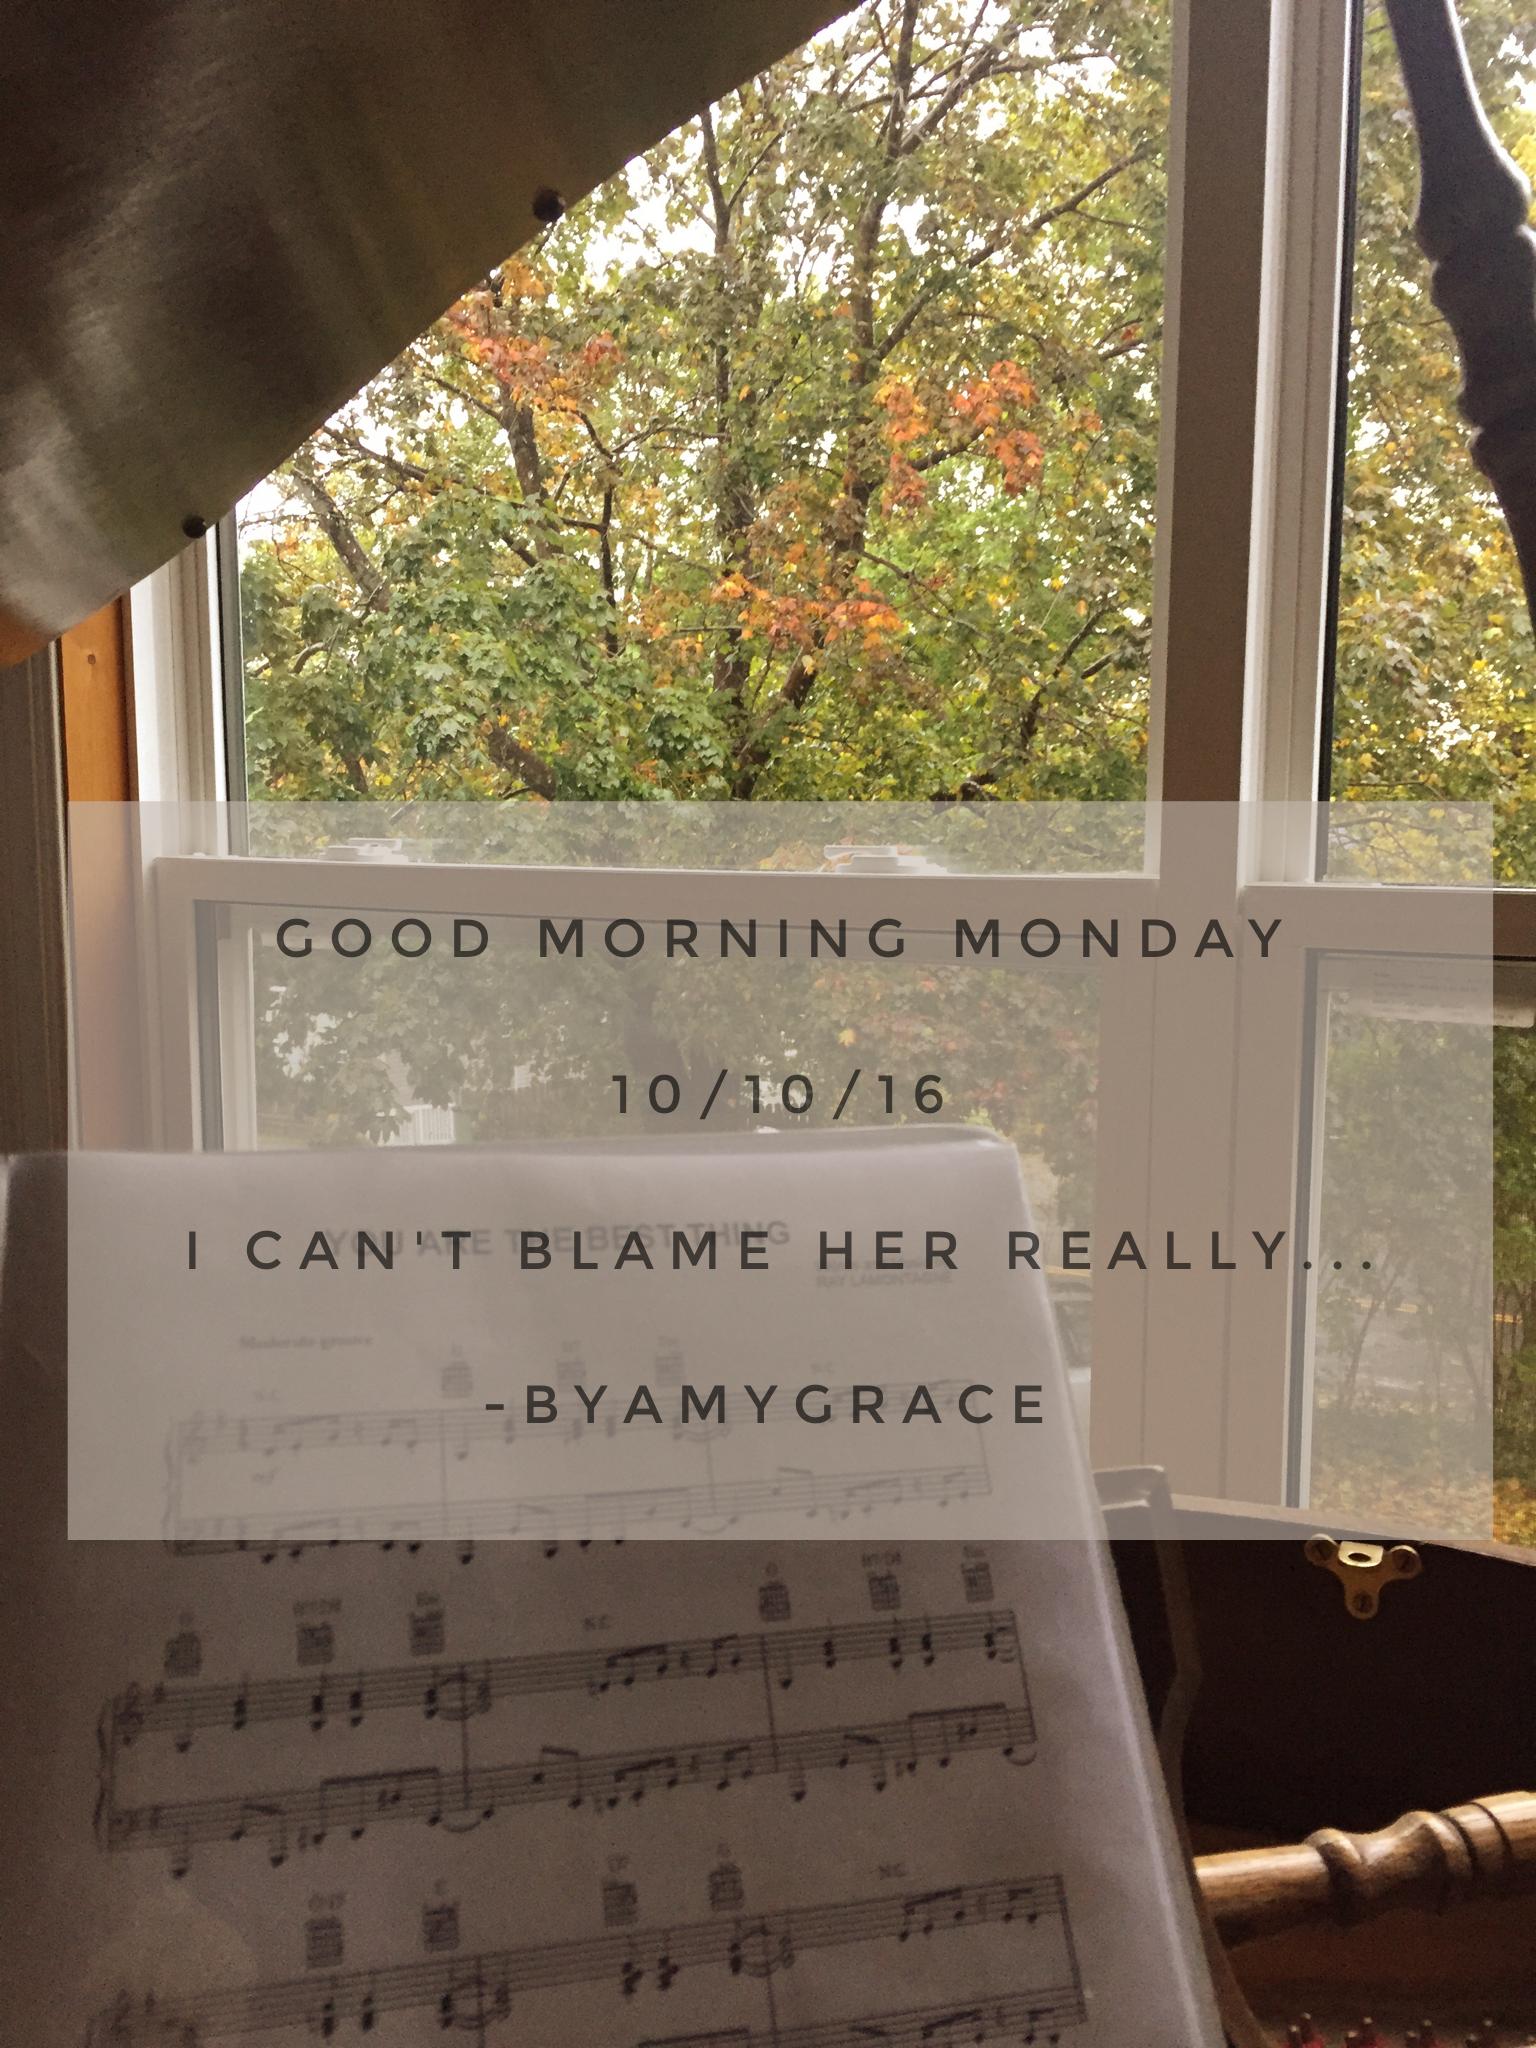 goodmorningmonday.10/10/16.byamygrace